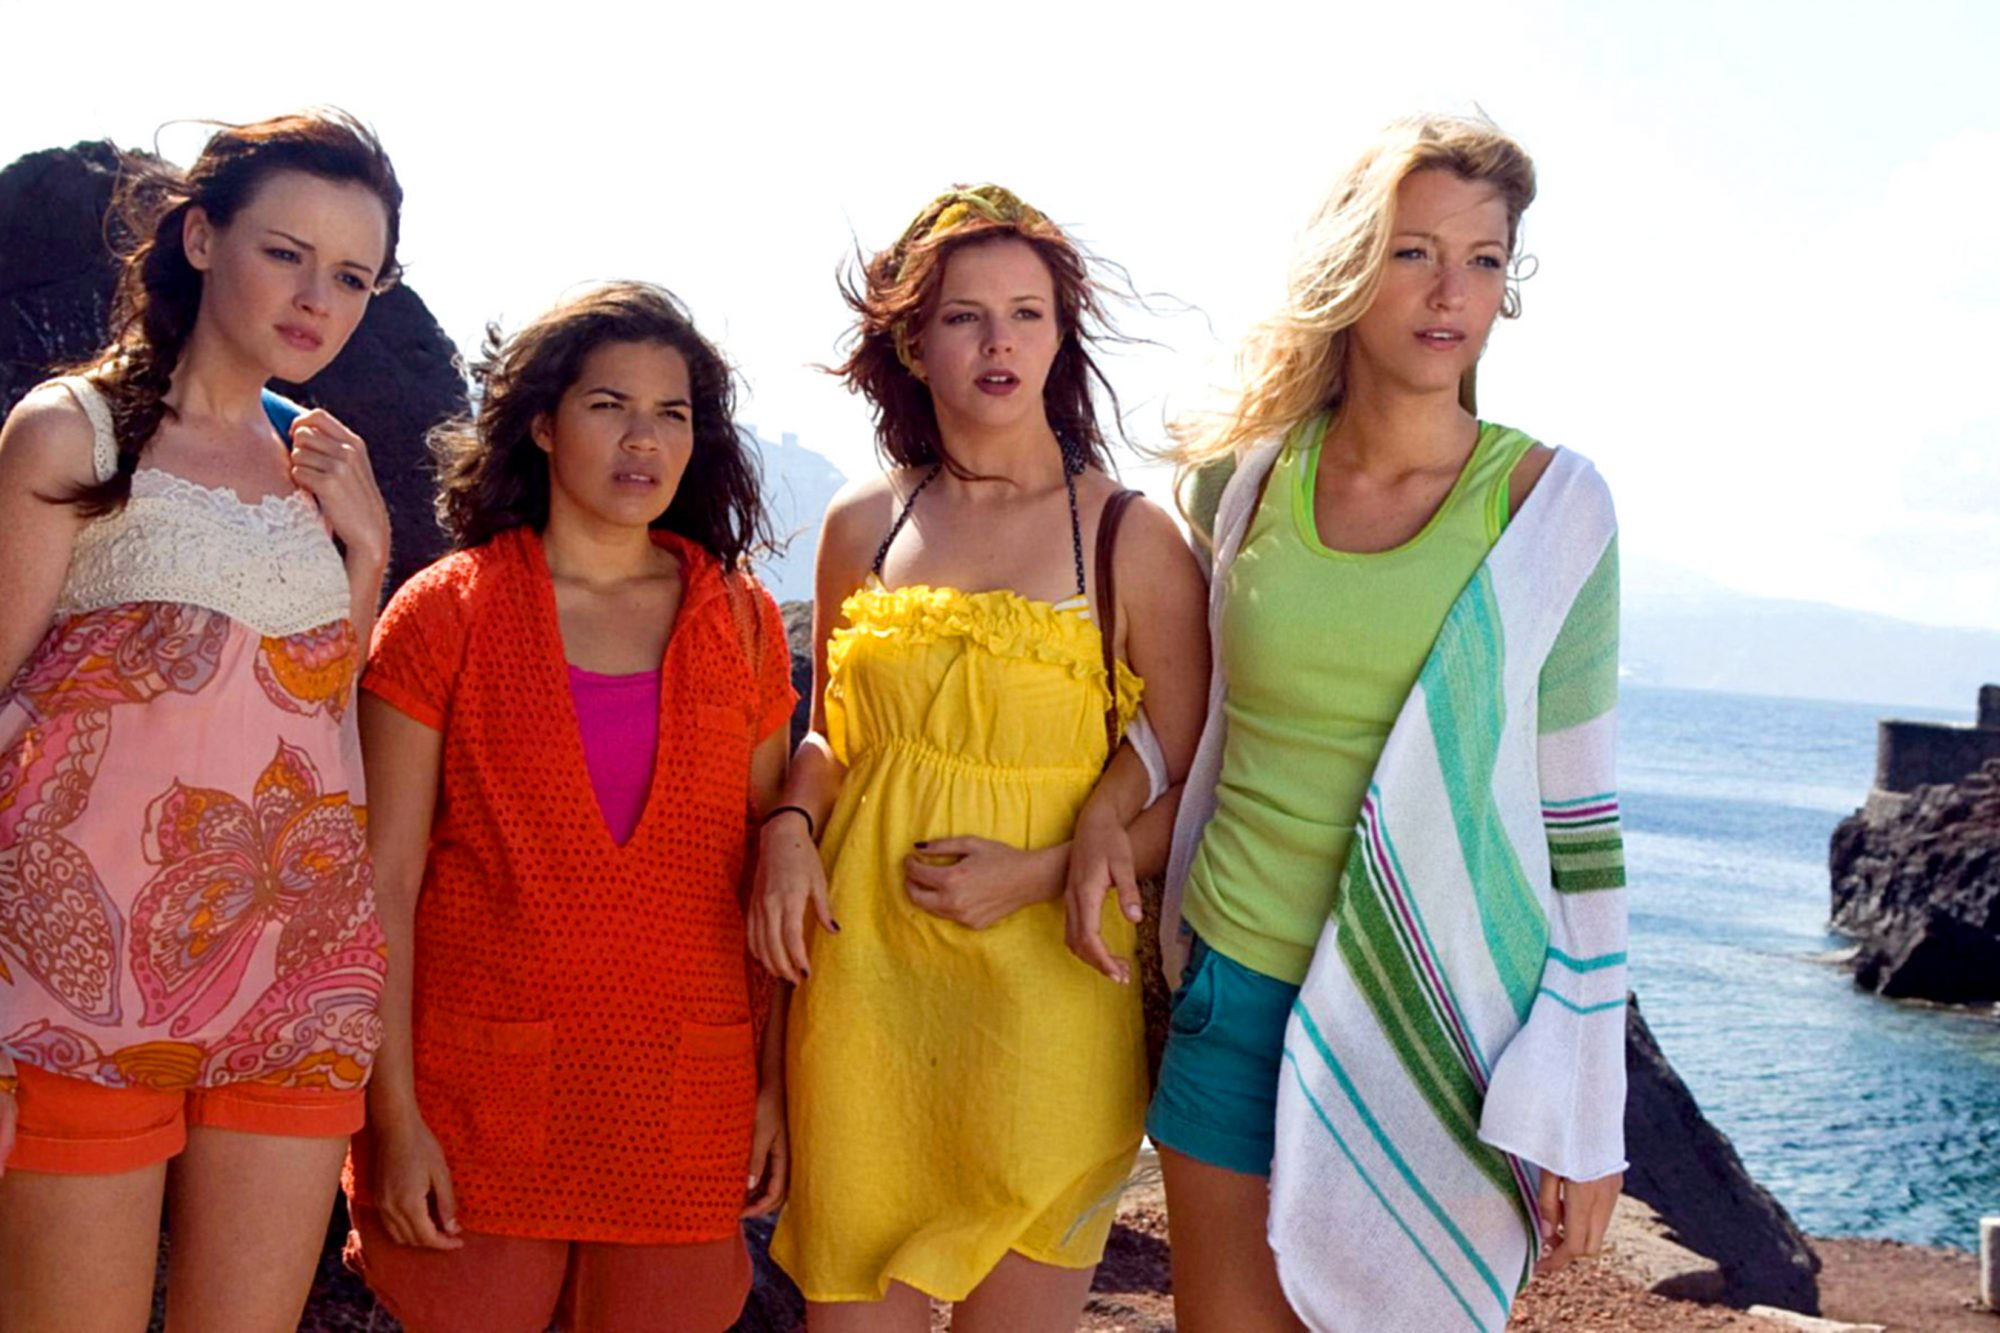 THE SISTERHOOD OF THE TRAVELING PANTS 2, from left: Alexis Bledel, America Ferrera, Amber Tamblyn, B